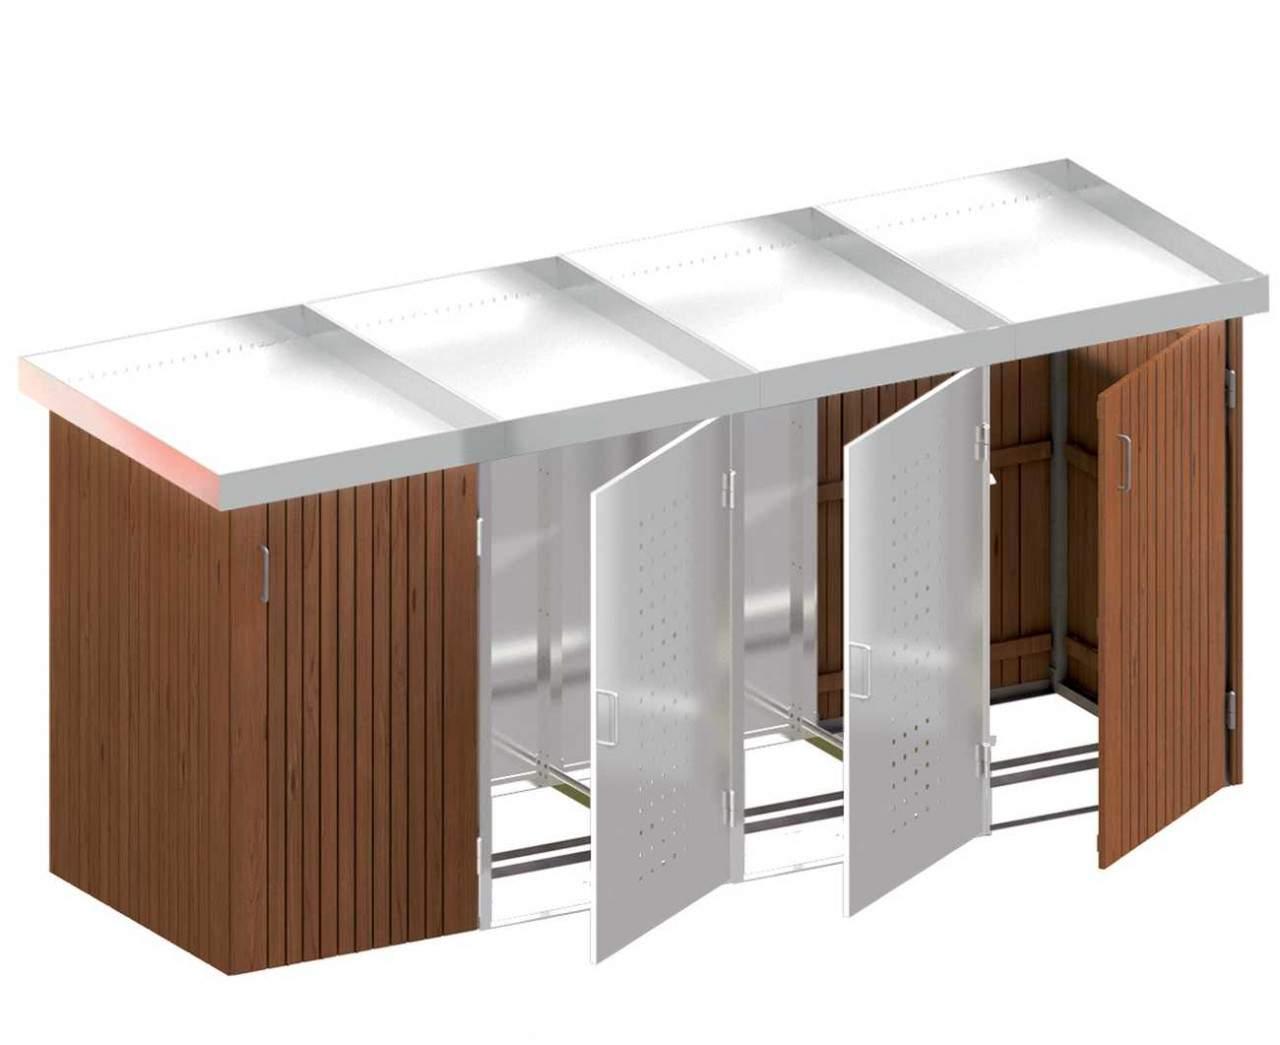 binto 4er hartholz edelstahl pflanzschale 1280x1280